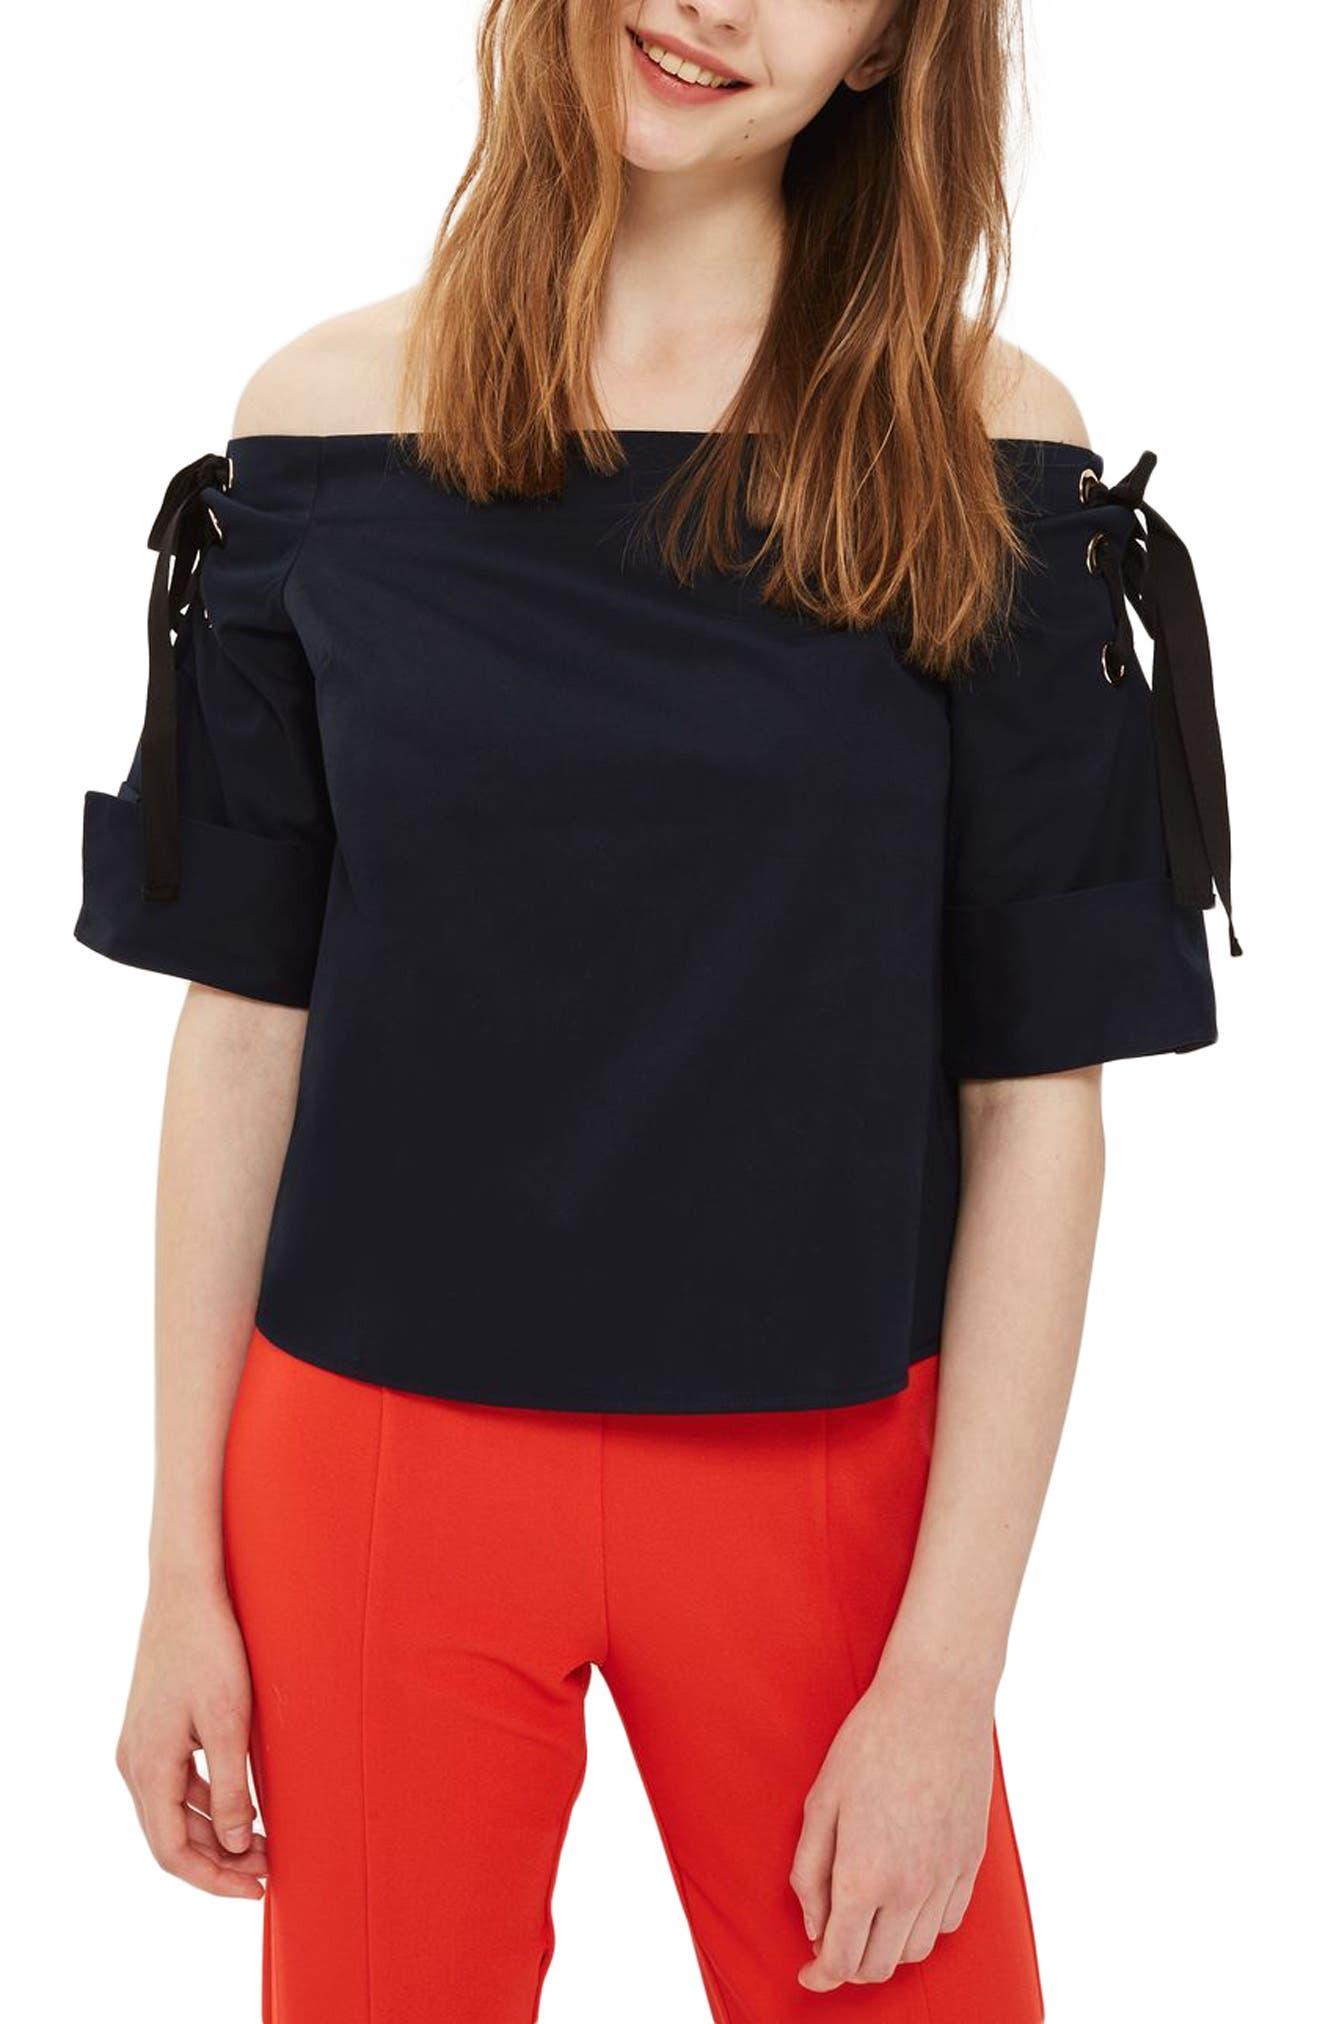 Topshop Lace-Up Off the Shoulder Top